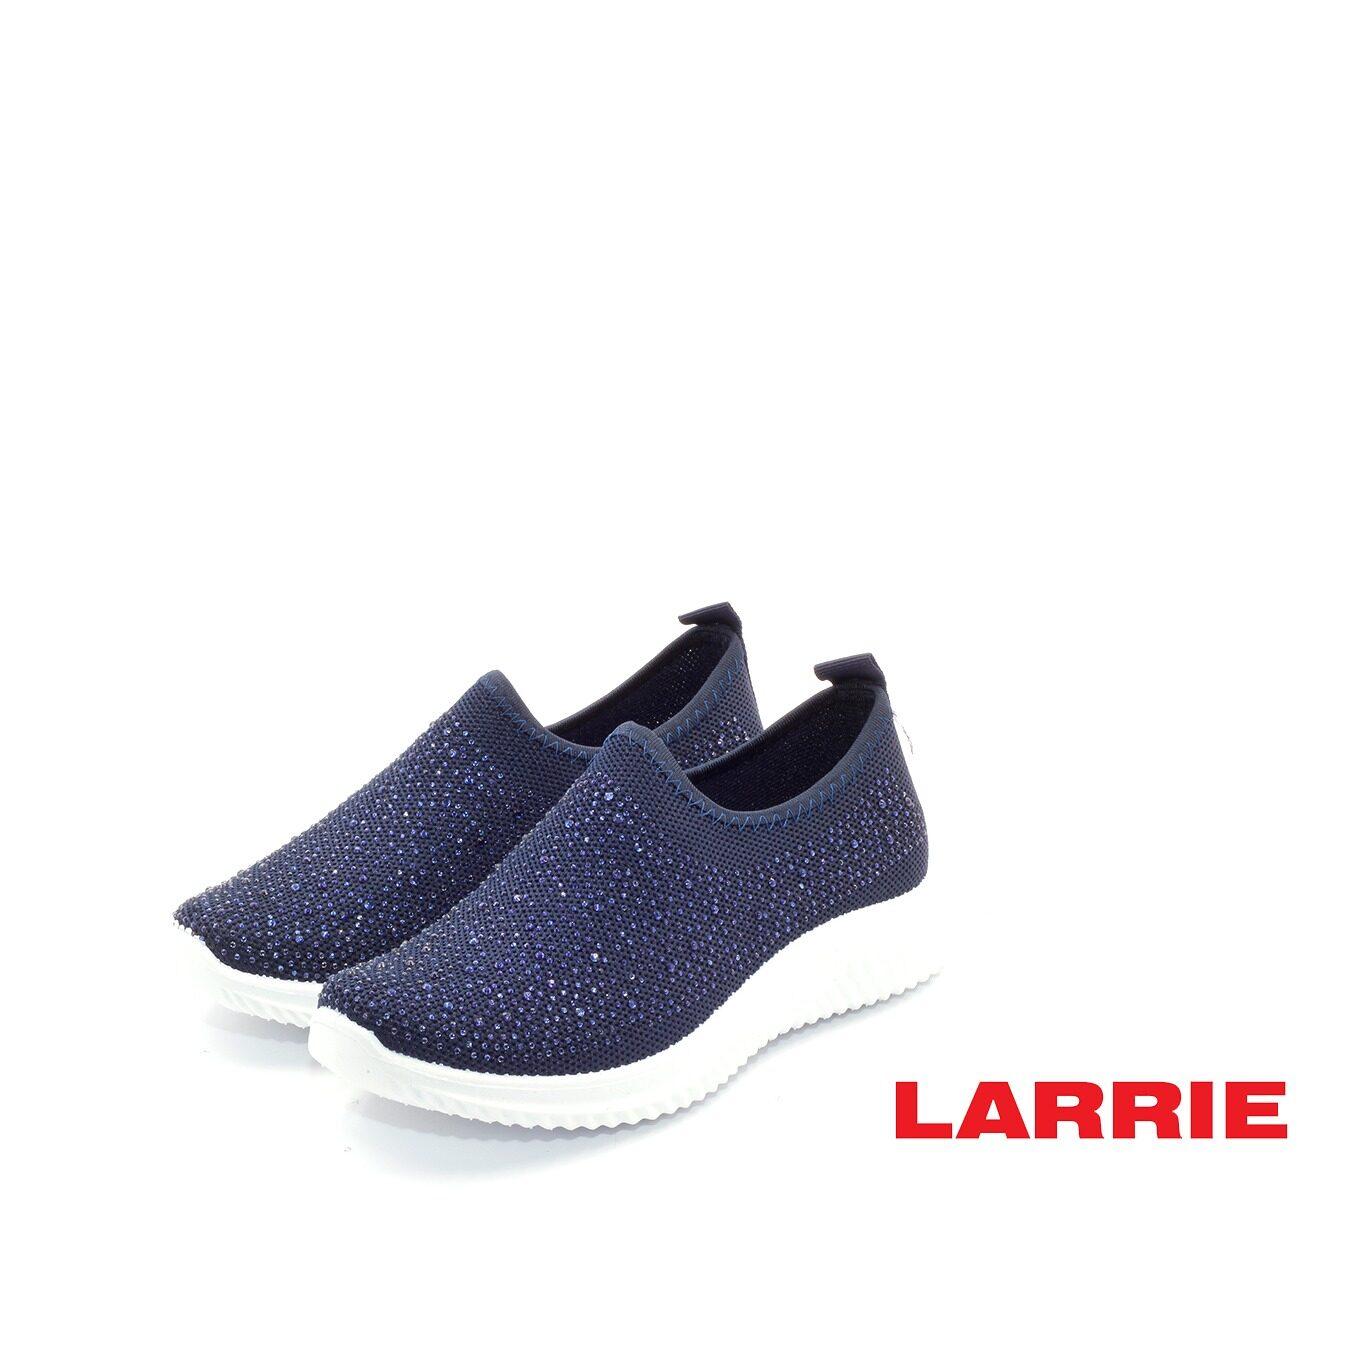 LARRIE Kasut Wanita Glitter Coated Comfort Sporty Sneakers - L62015-TF01SV